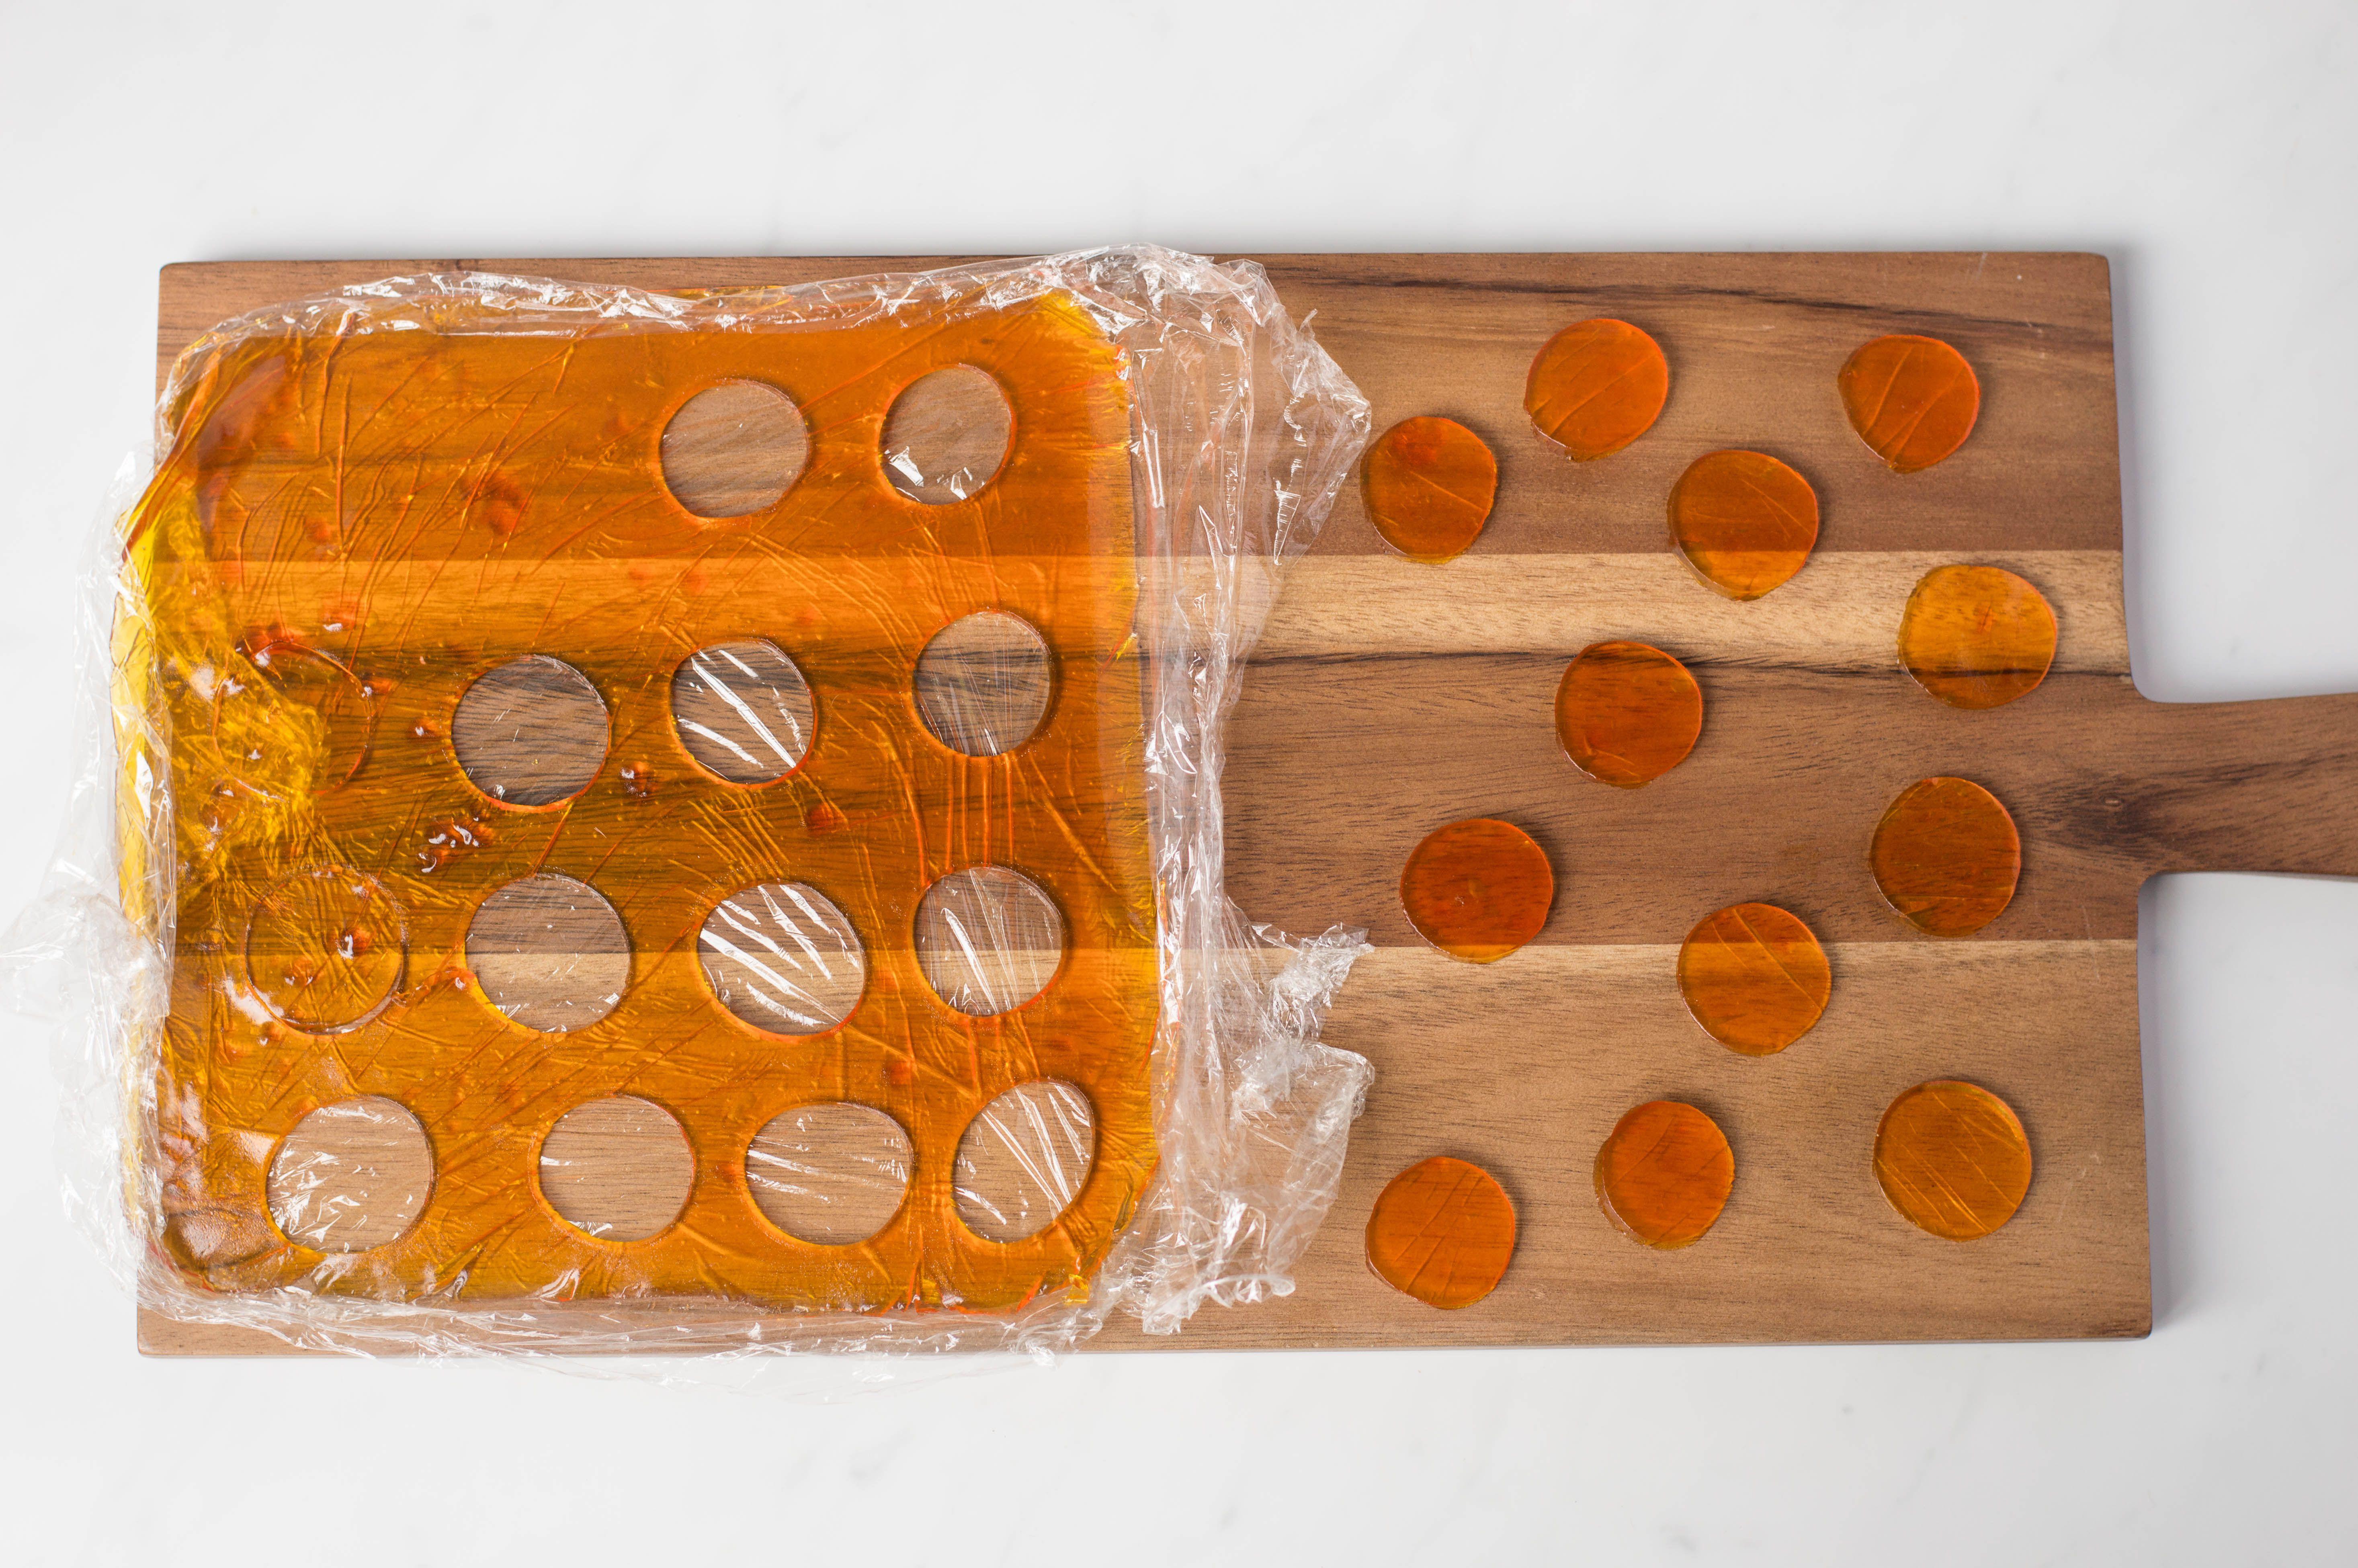 cut discs of orange jelly